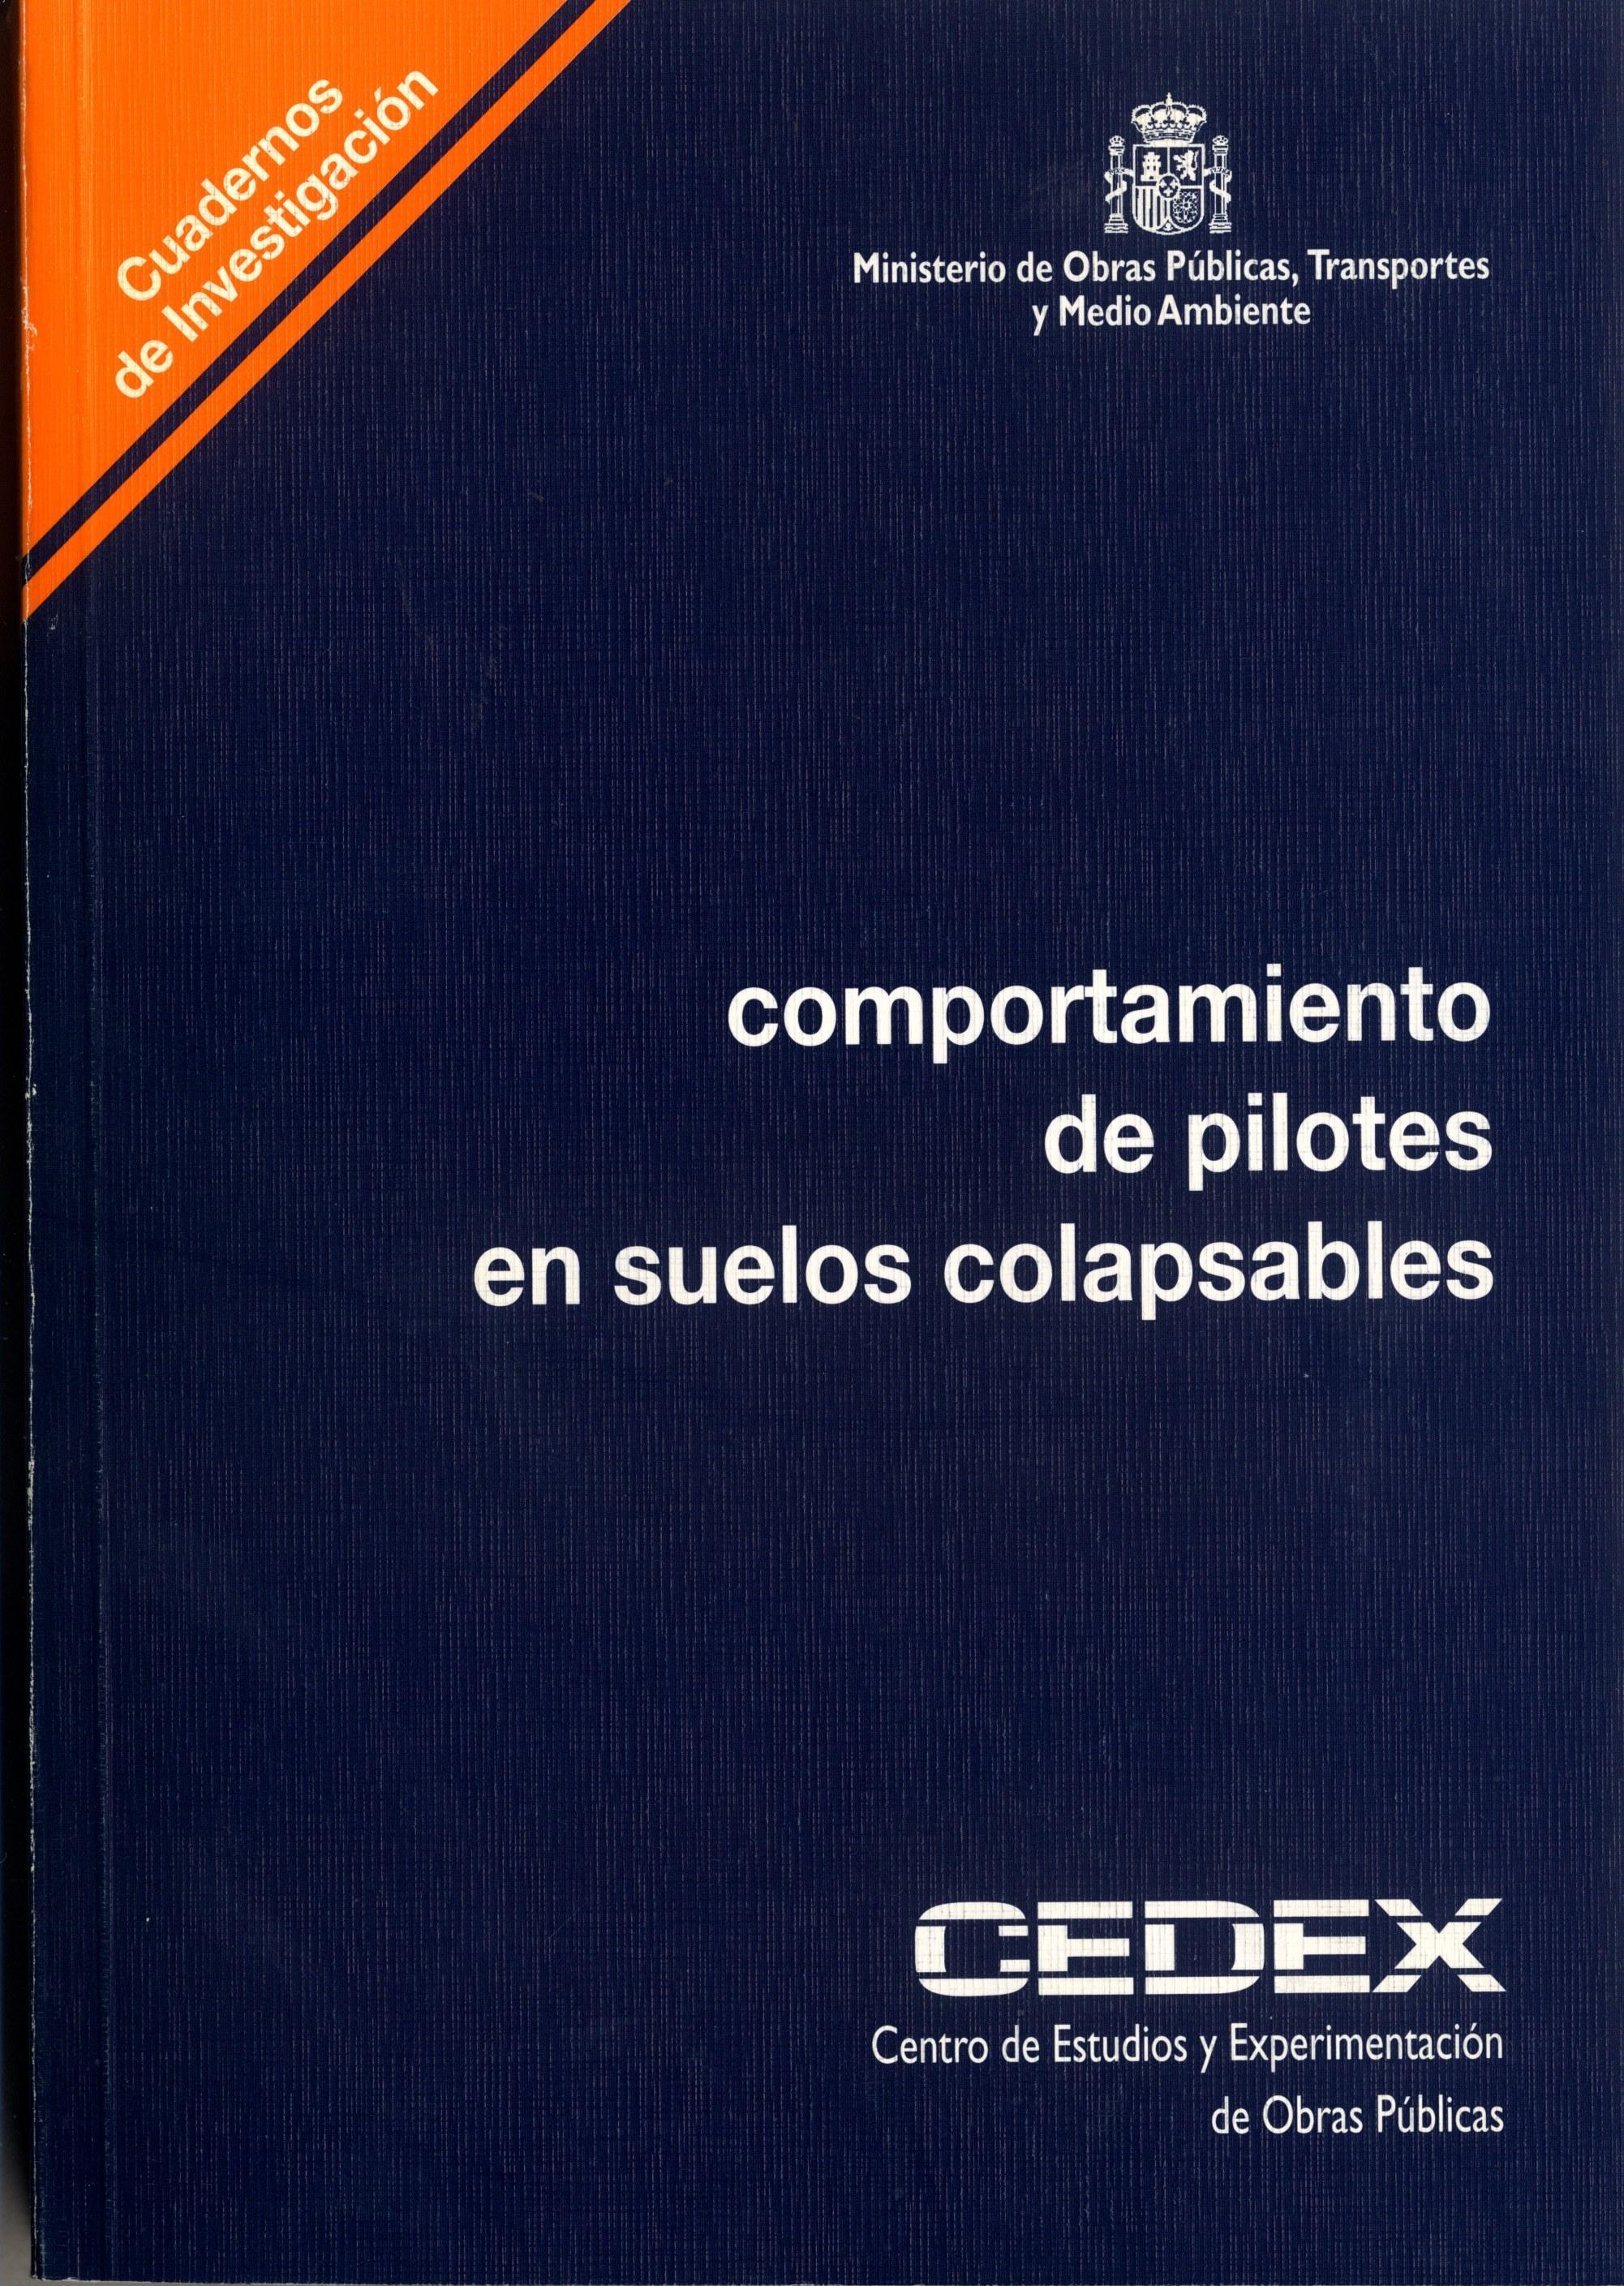 COMPORTAMIENTO PILOTES SUELOS COLAPSABLES